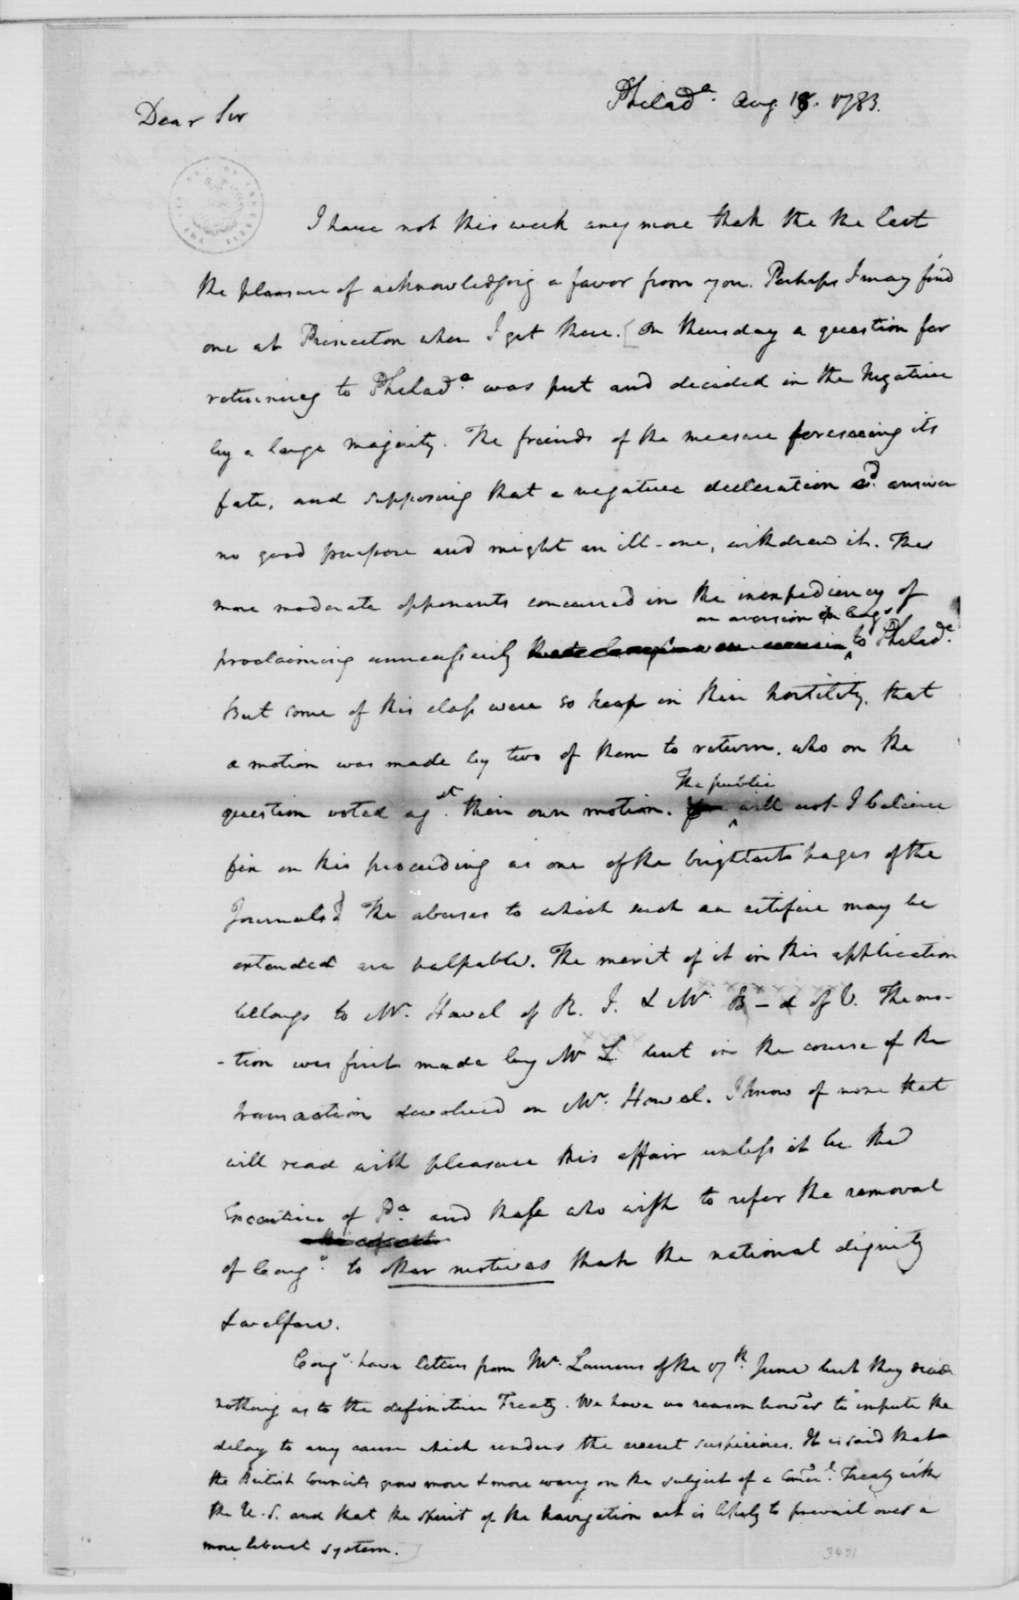 James Madison to Edmund Randolph, August 31, 1783.